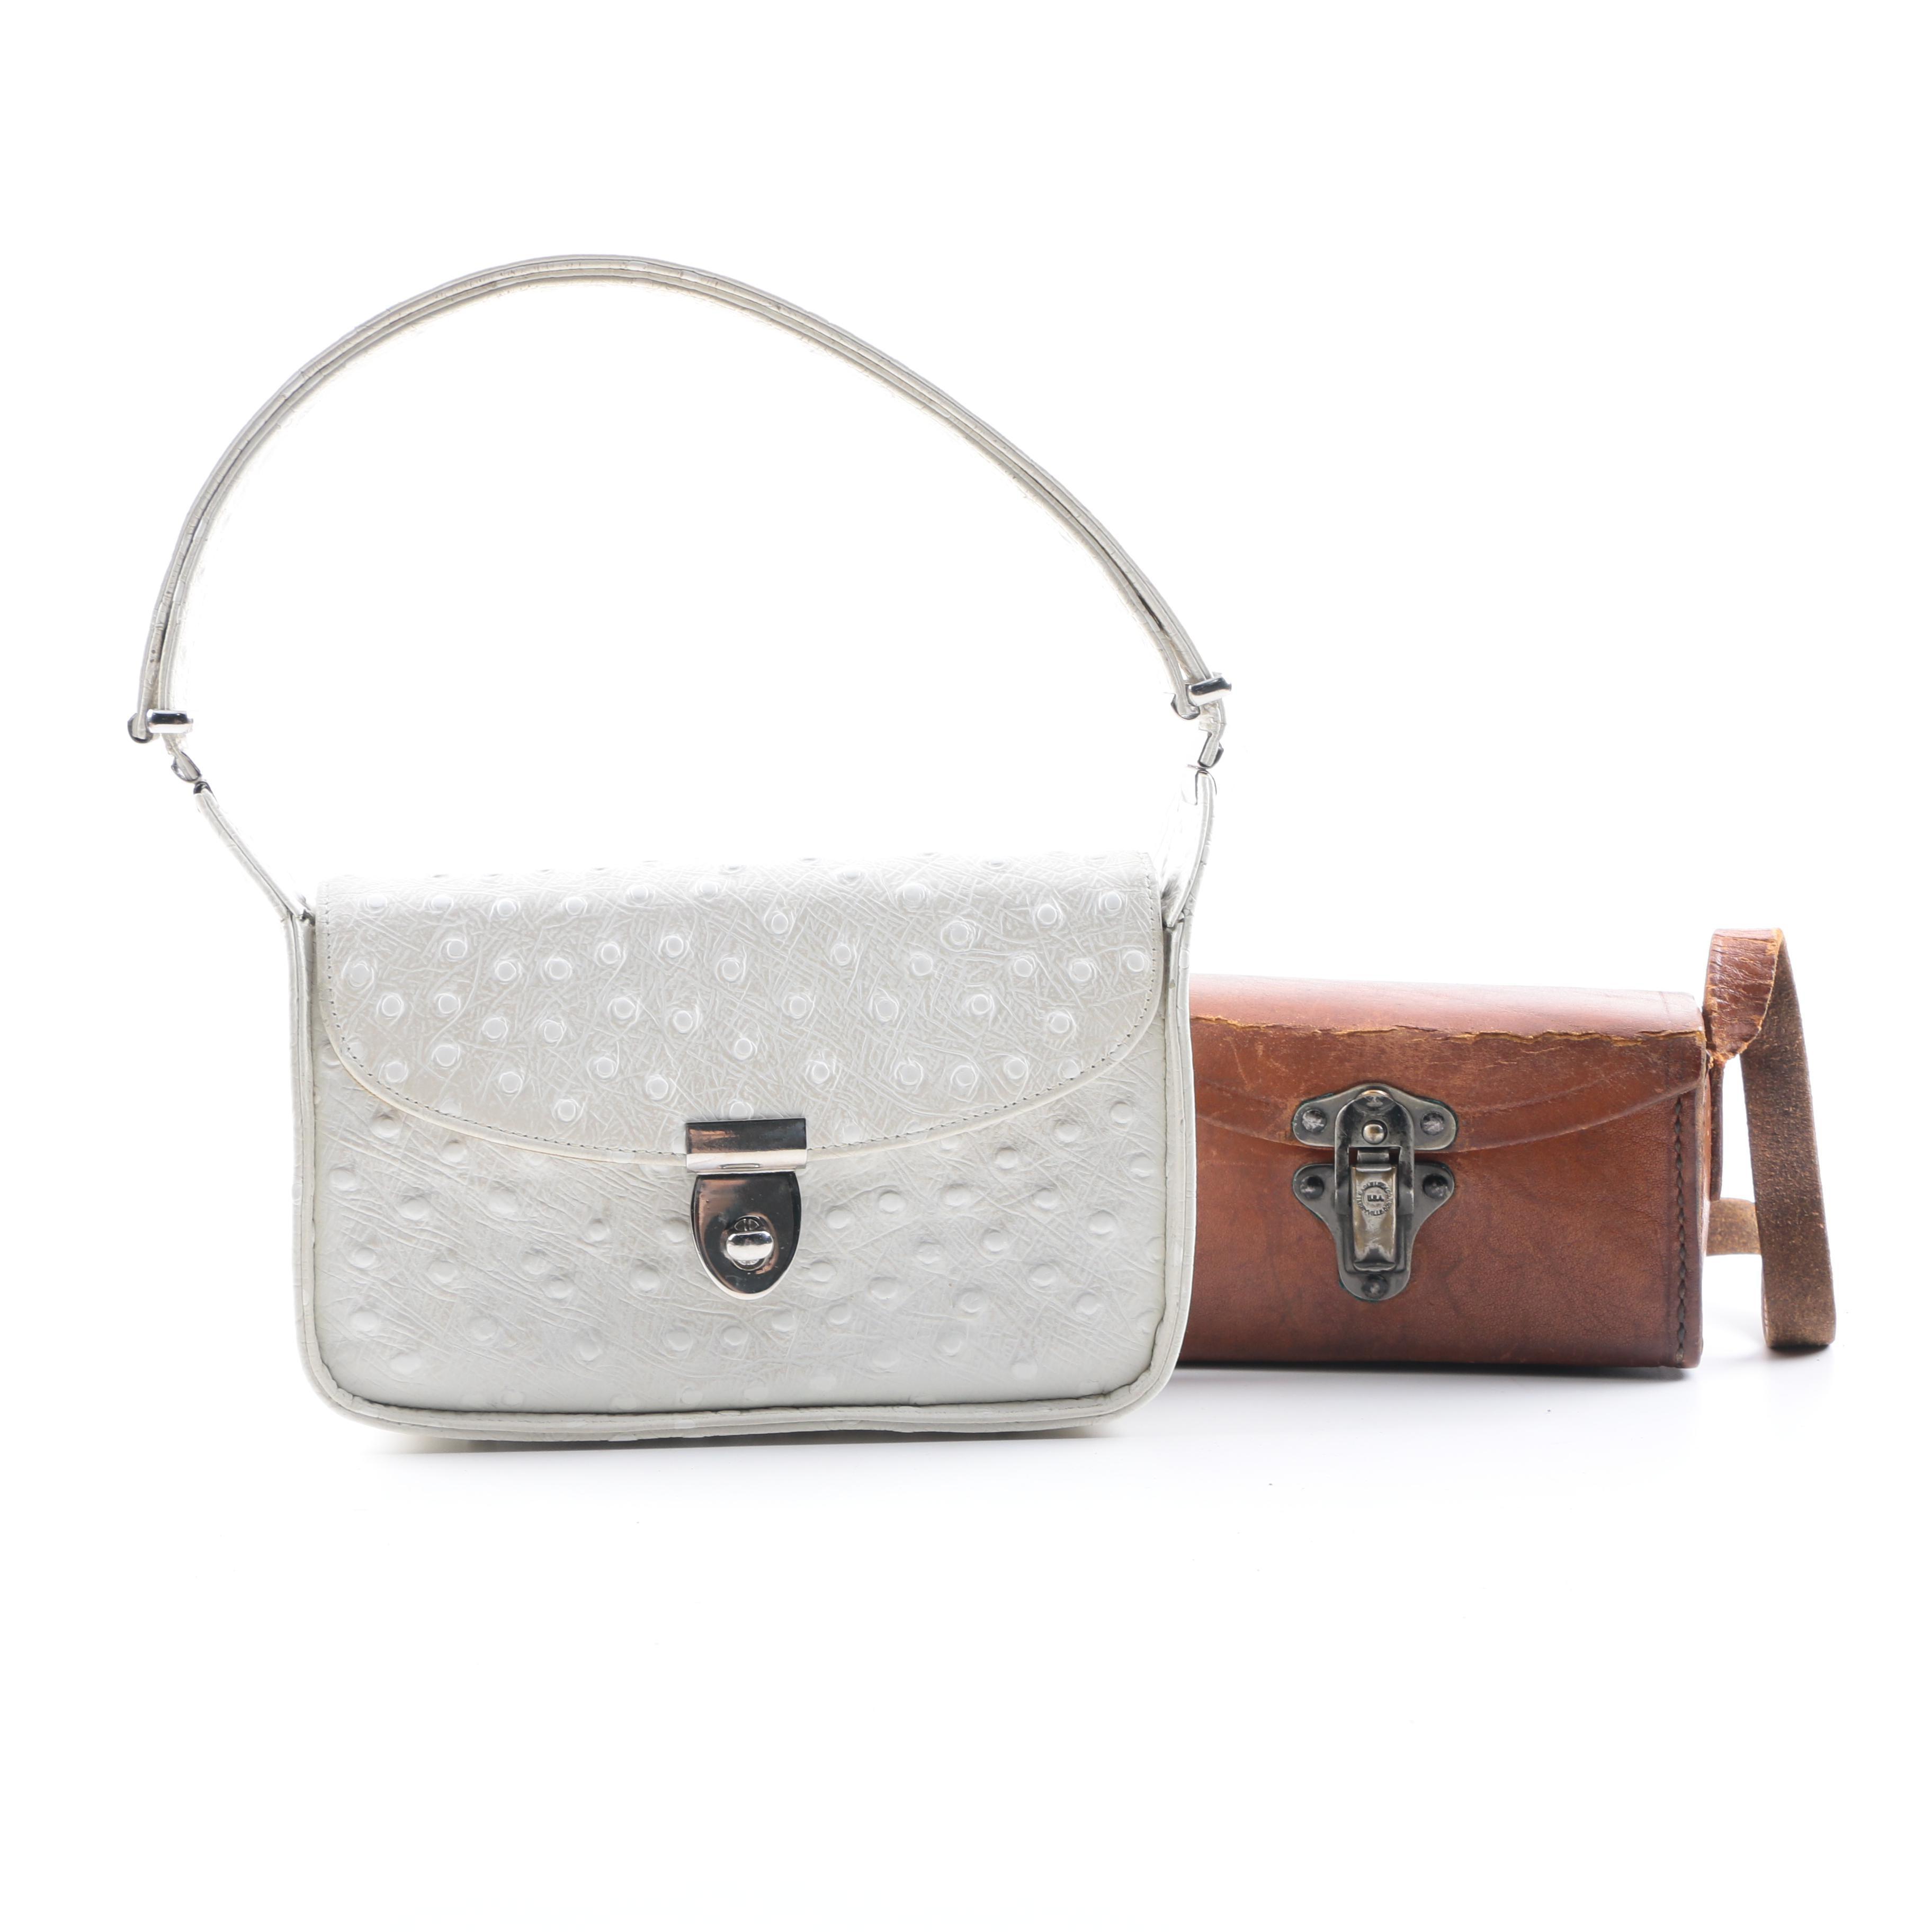 Vintage Handbag and Crossbody